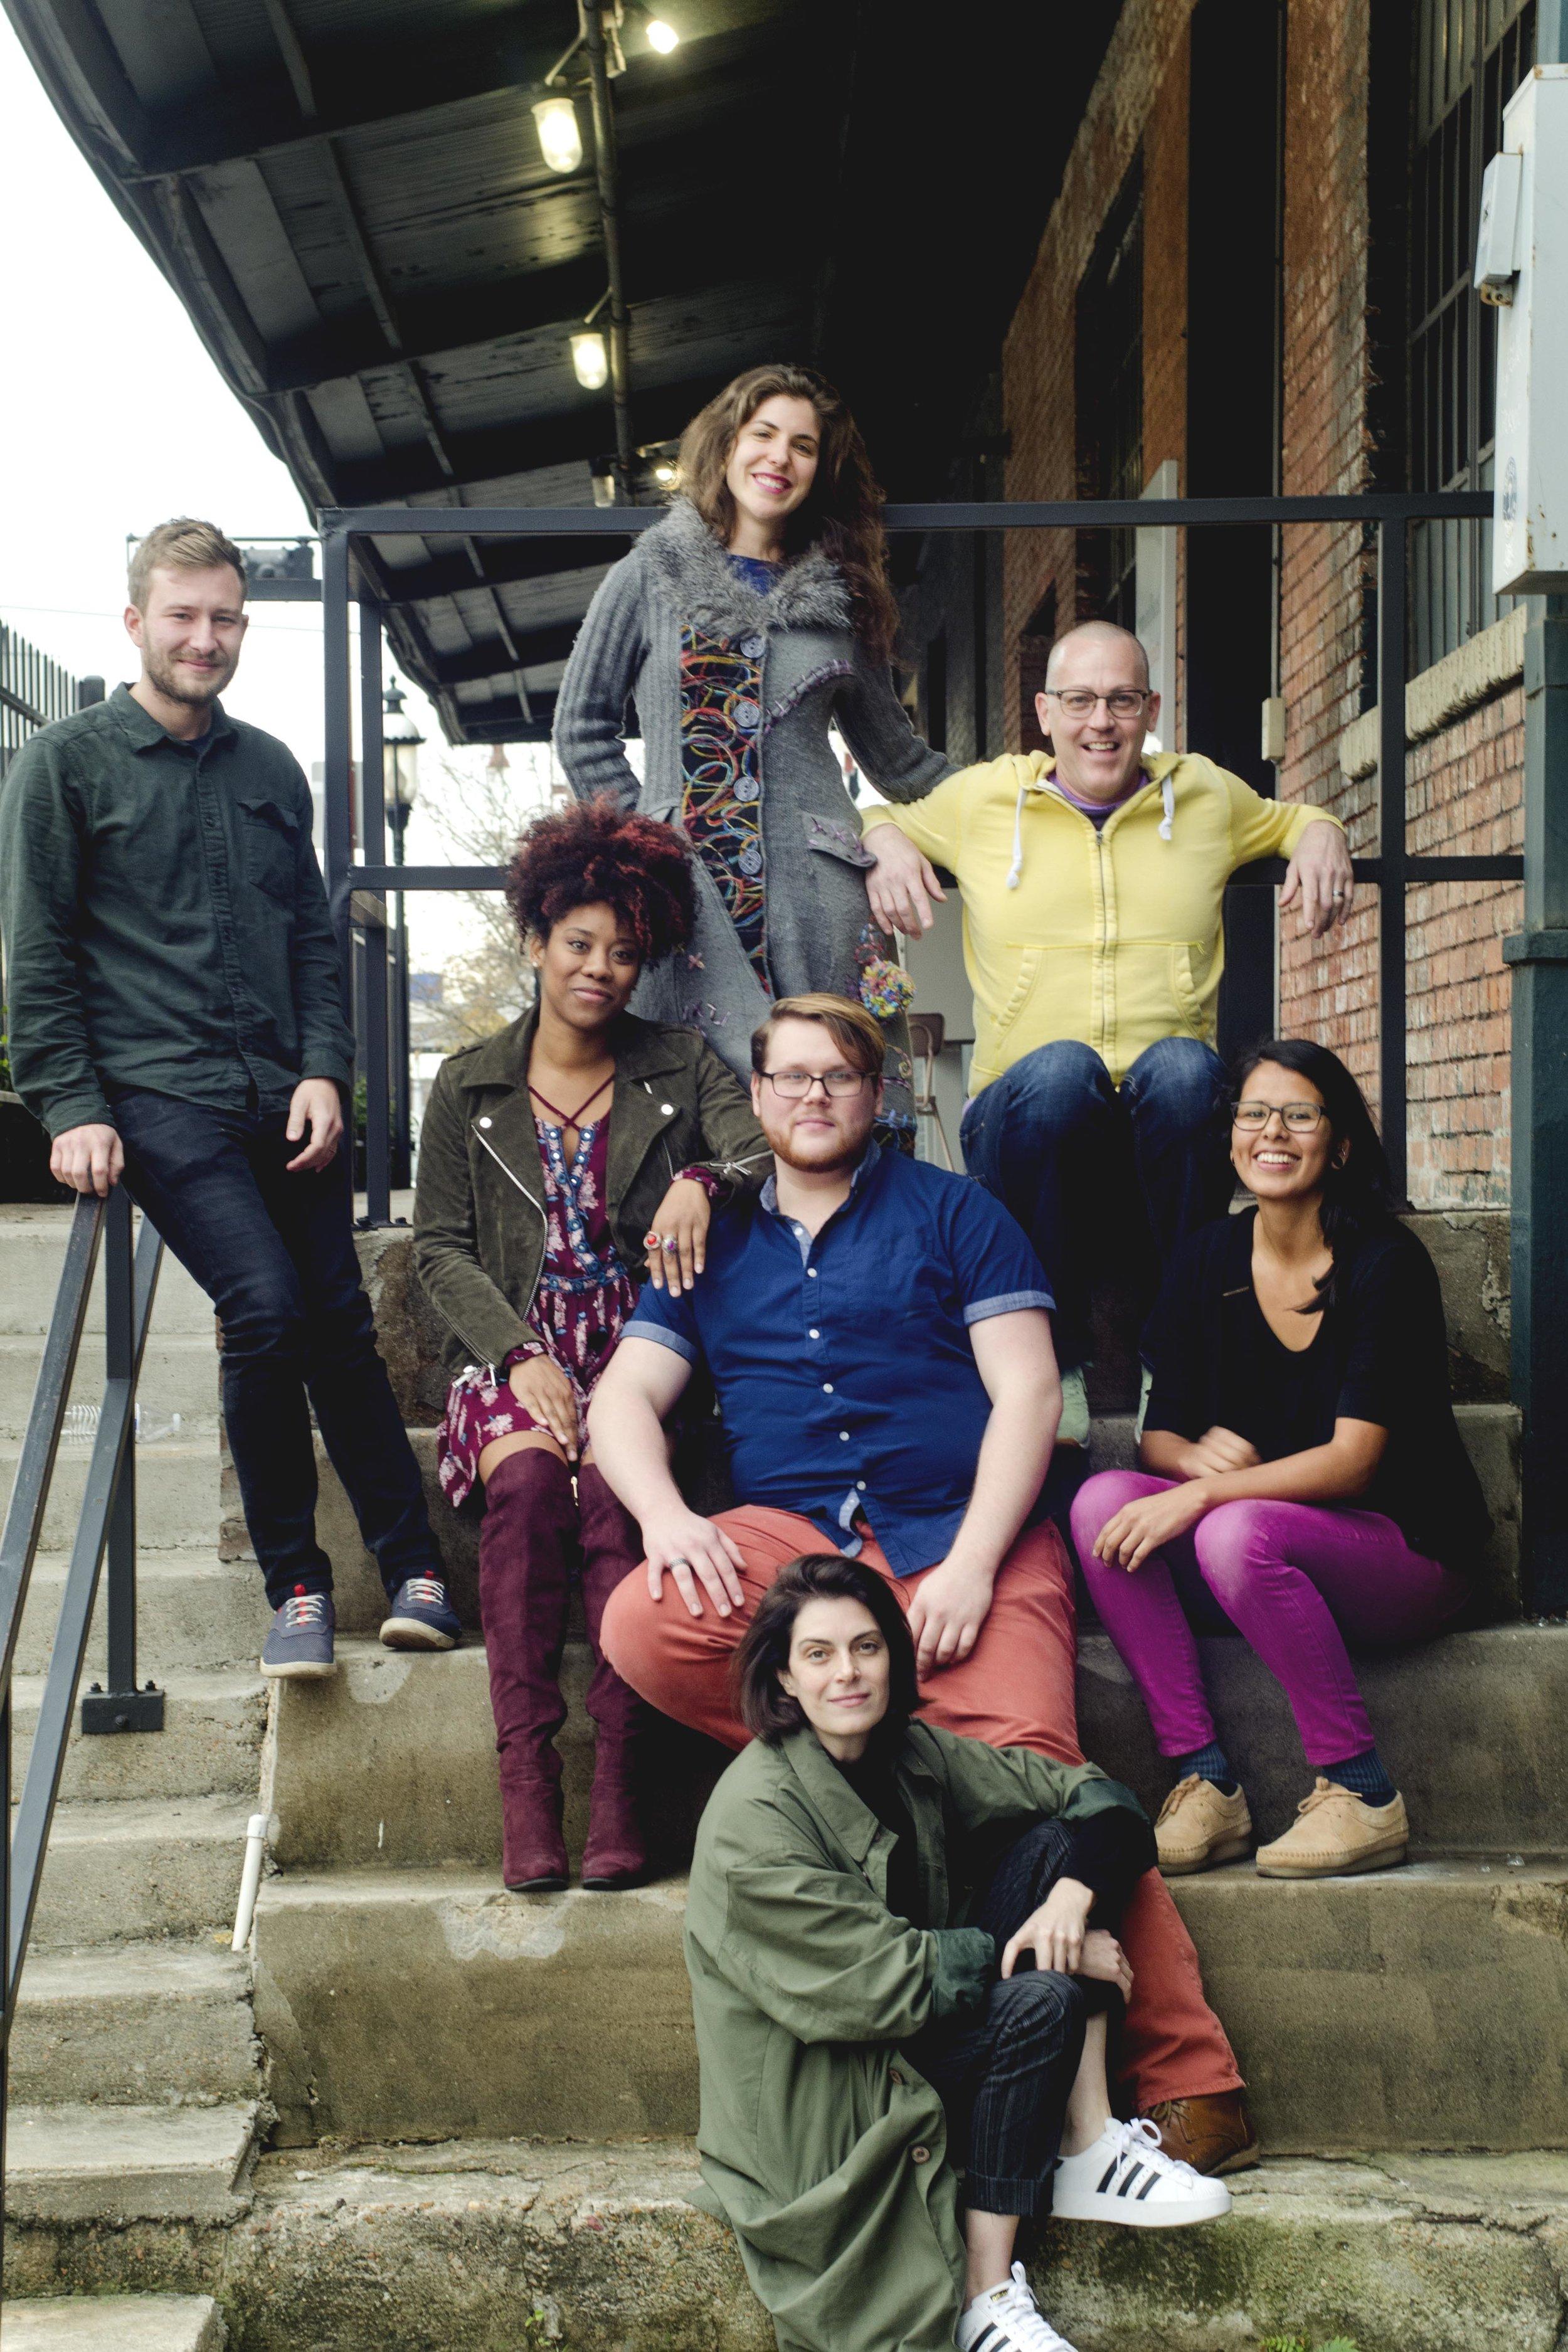 2018 Artists in Residence. (Top row from L to R) Joe Wozny,Daniela Antelo, Jhon Stronks, (Middle row from L to R) Candice D'Meza, Camron Alexander, Brenda Cruz (Bottom row) Nancy Douthey